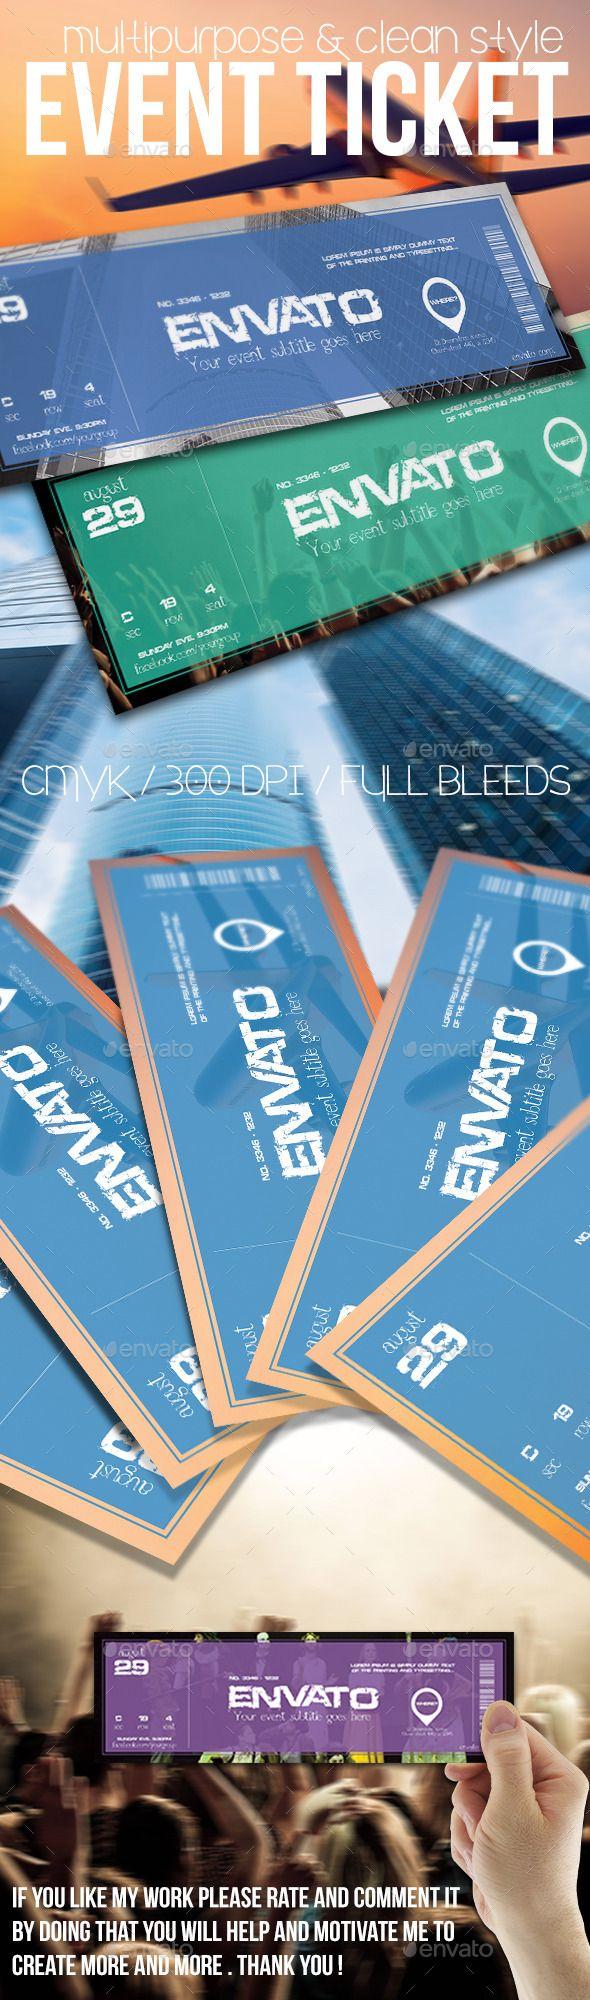 best ideas about event tickets ticket design multipurpose event ticket